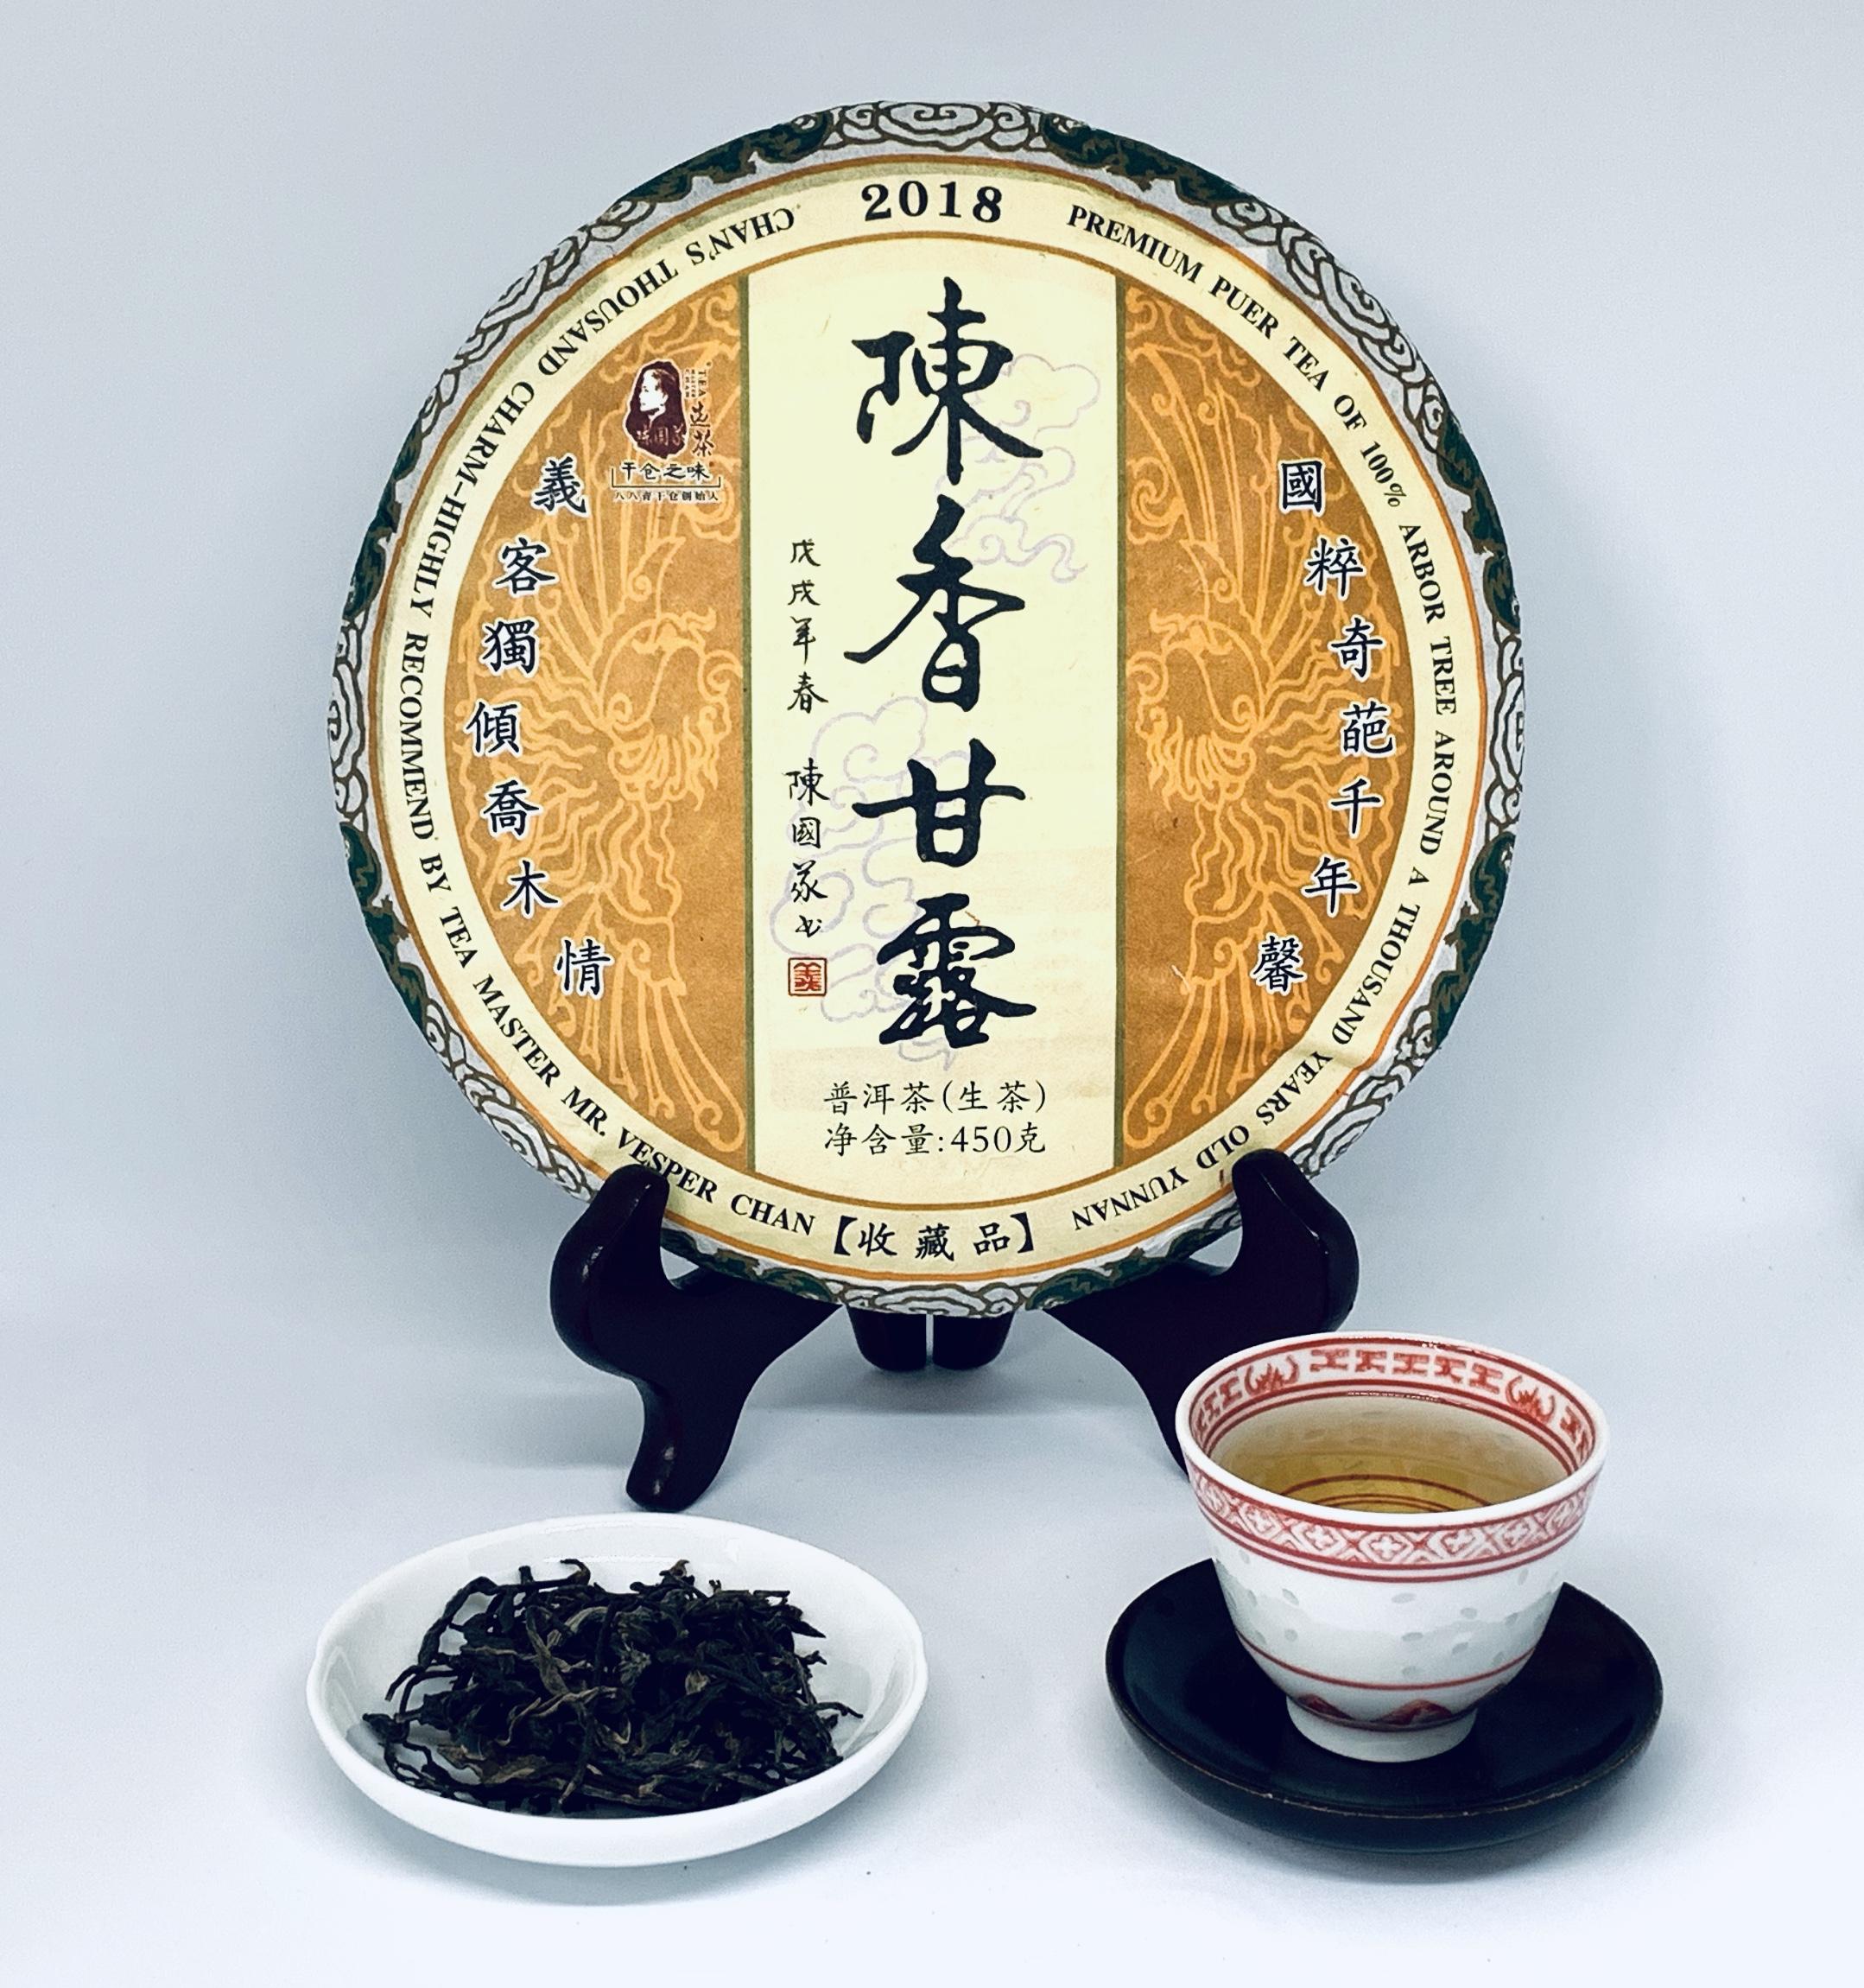 Chan's Thousand Charms Raw Pu-erh Tea Collector's Edition 2018